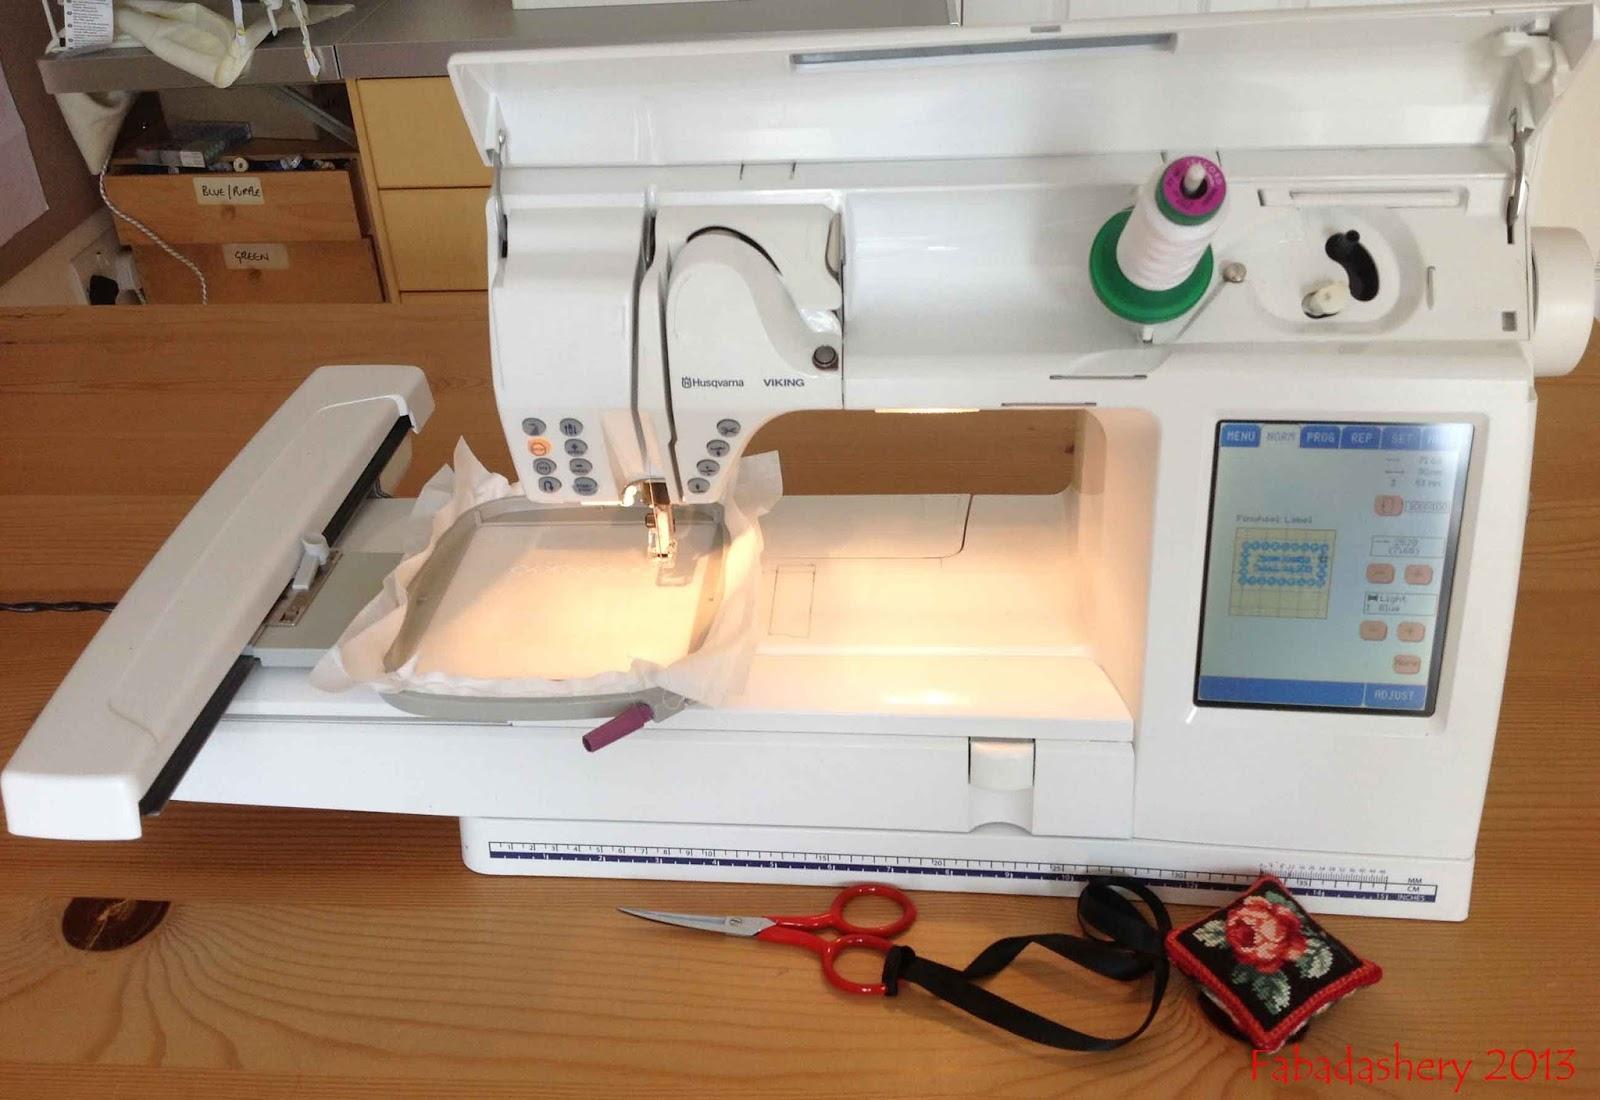 Sewing Machine With Labels Singer Schematic Diagram Necchi Supernova Threading Vintage Download